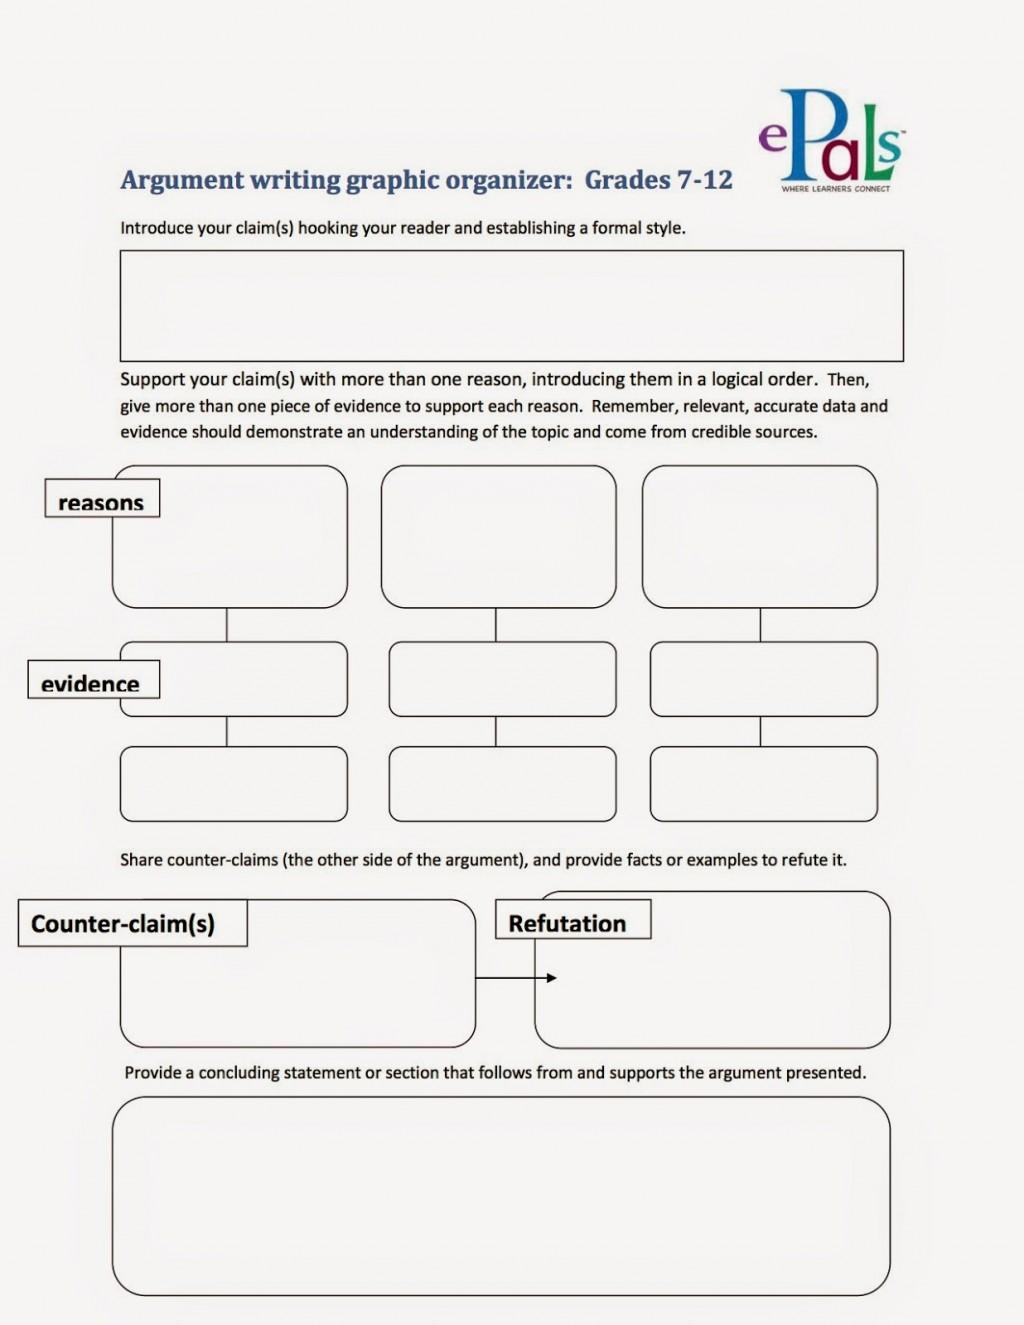 005 Argumentgraphicorganizer2bcopy Argument Essay Graphic Organizer Breathtaking Persuasive Examples Middle School Argumentative Pdf Large